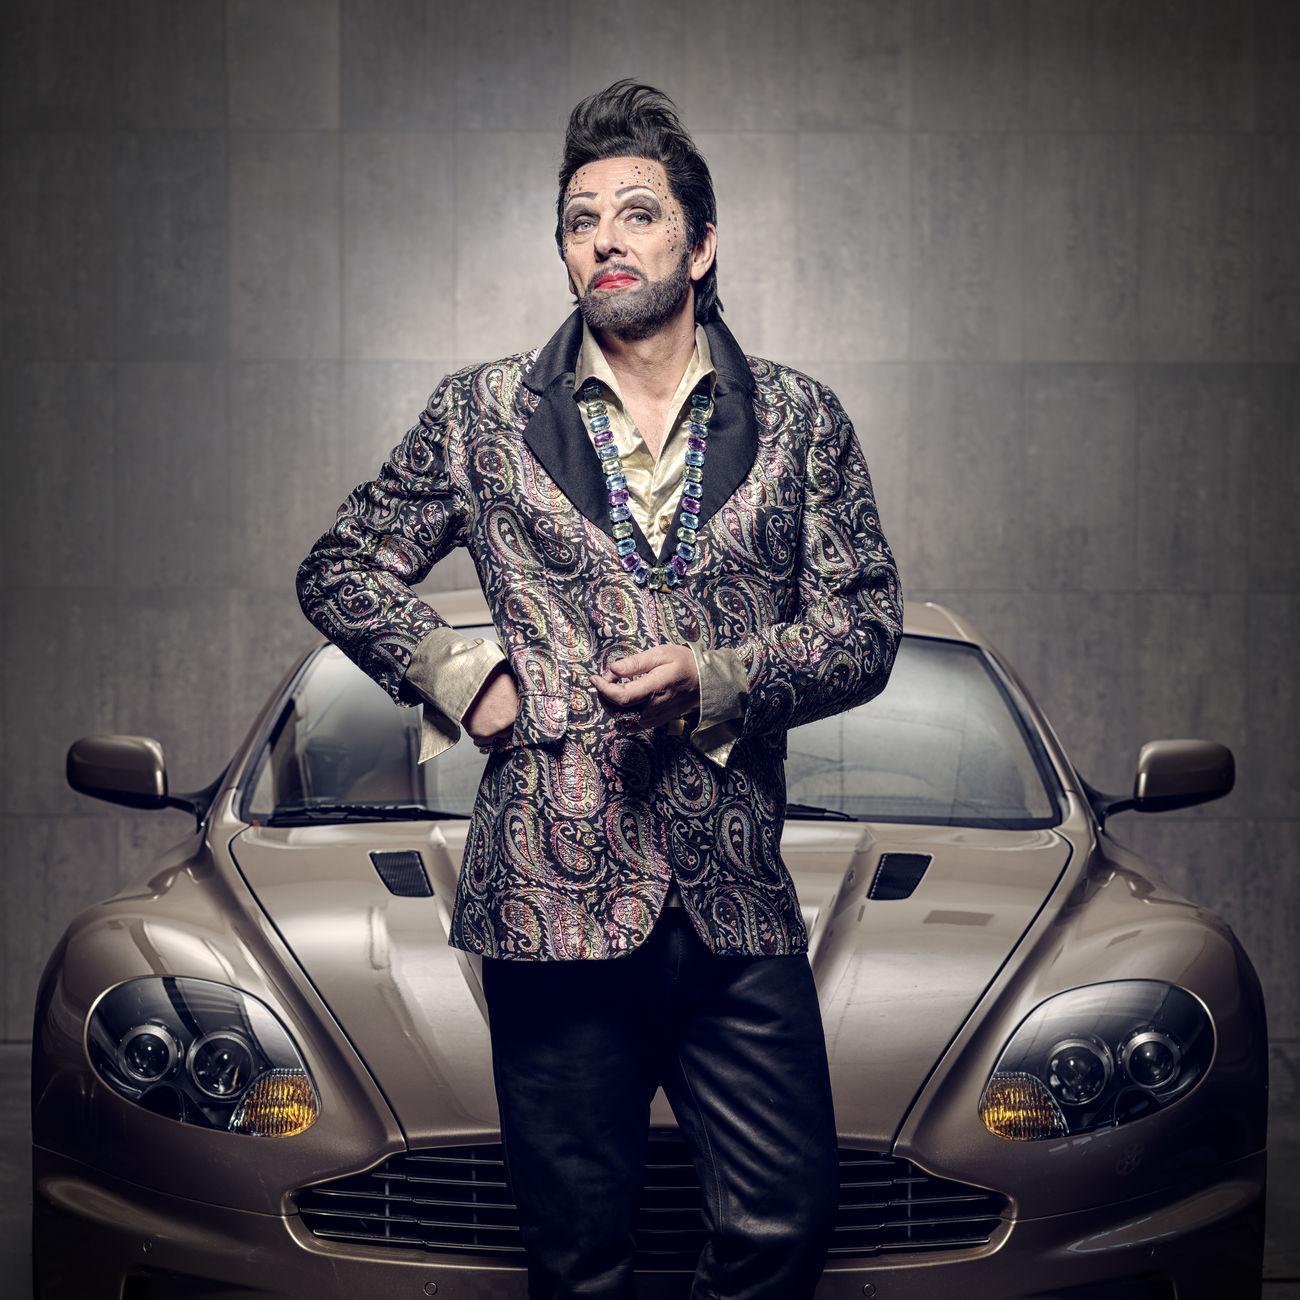 Jööhan Aston Martin Car Fashion Glamour Lifestyles Looking At Camera Men Portrait